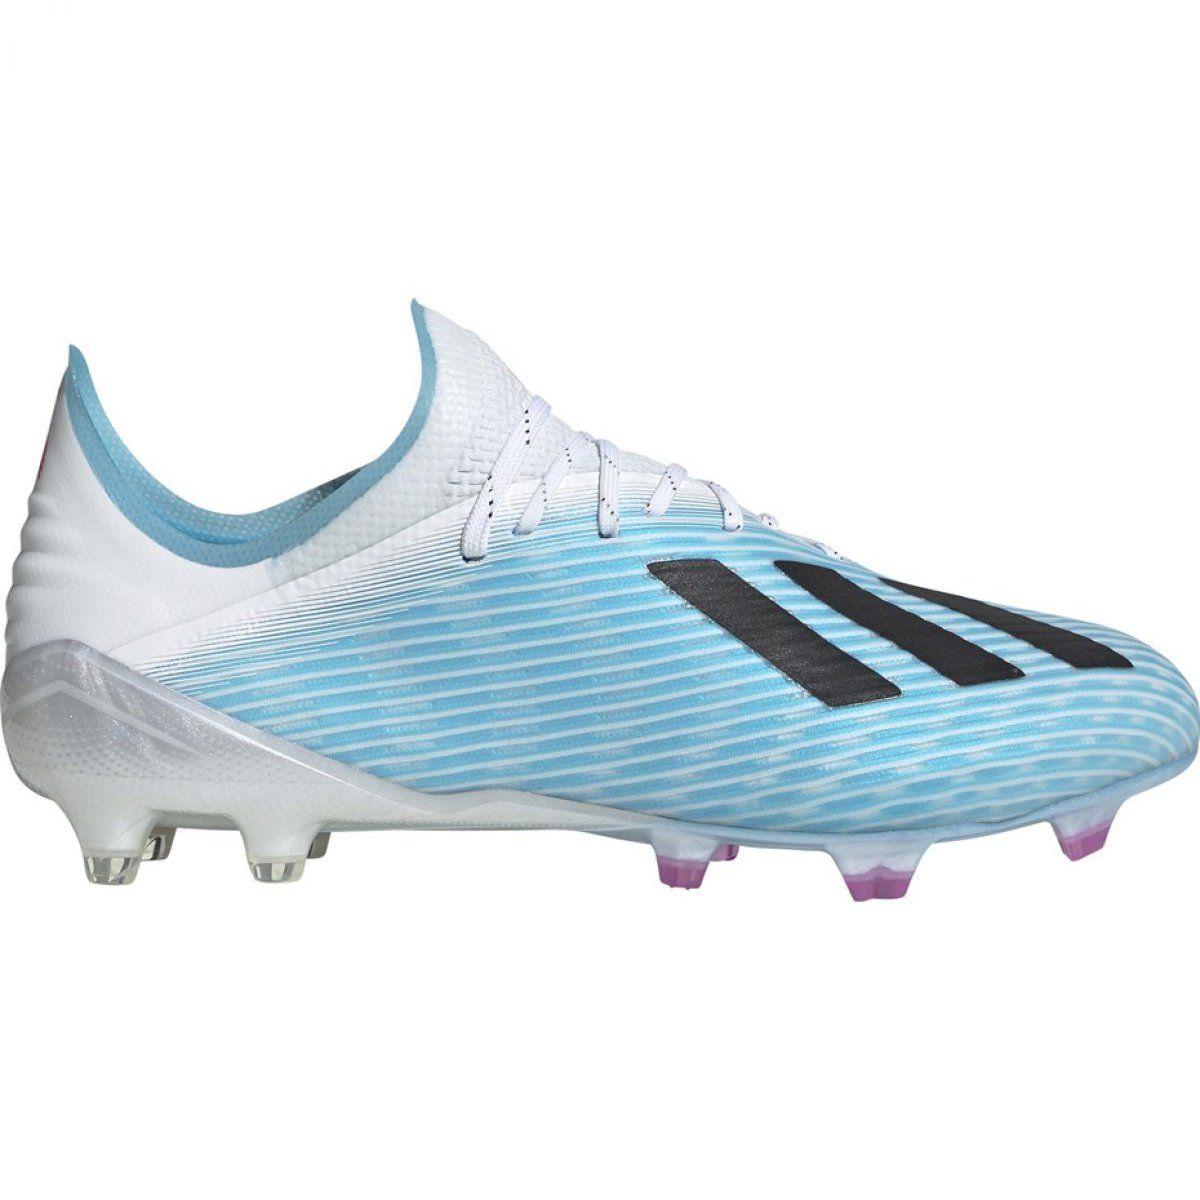 Buty Pilkarskie Adidas X 19 1 M Fg F35316 Niebieskie Wielokolorowe Football Shoes Mens Football Boots Blue Shoes